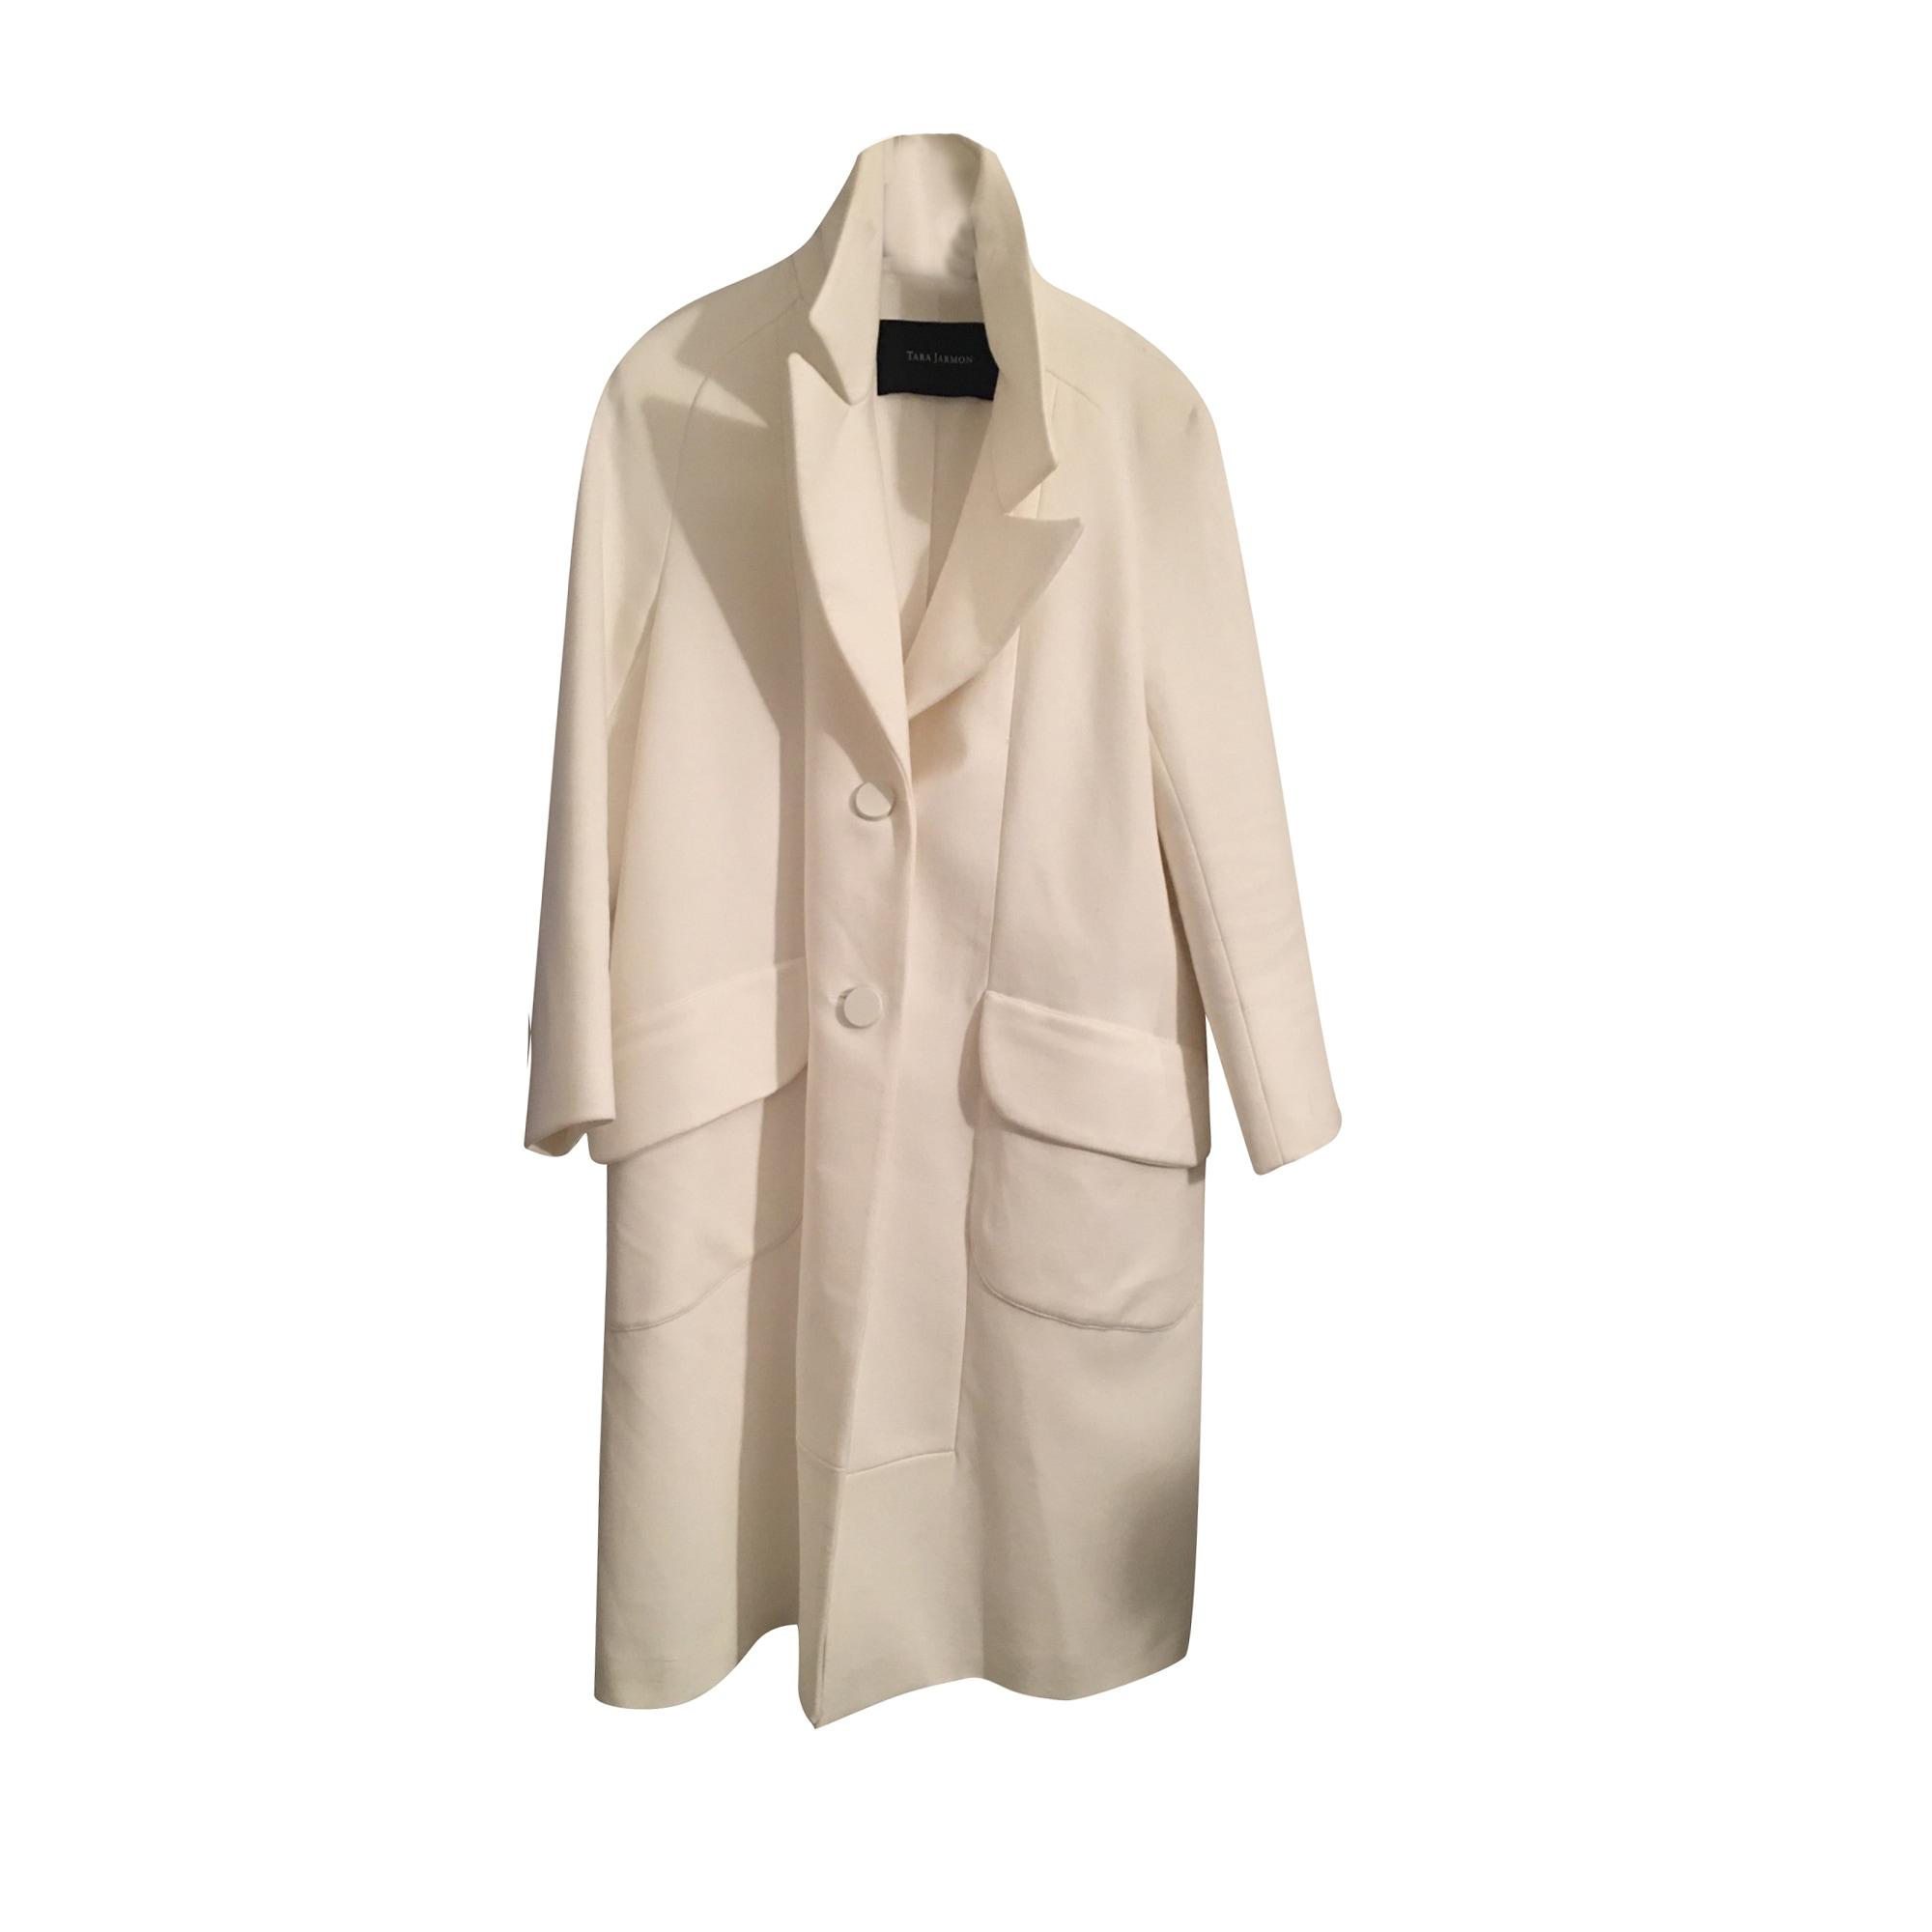 Manteau TARA JARMON Blanc, blanc cassé, écru